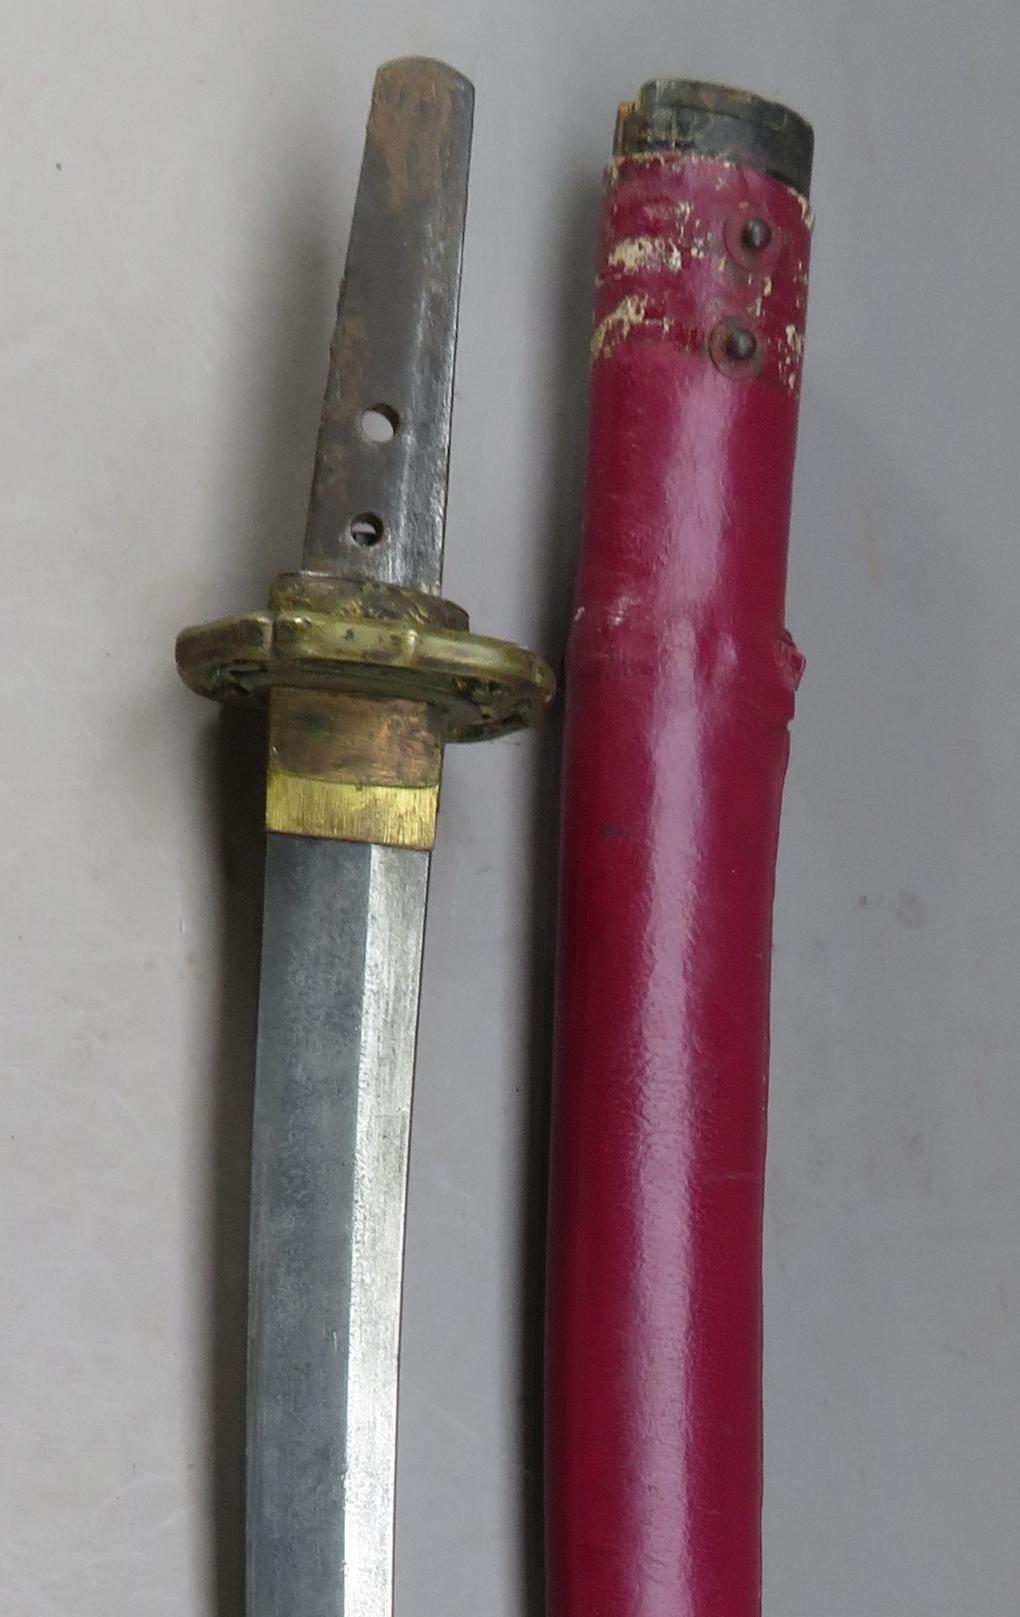 Ⓦ A JAPANESE SHORTSWORD (WAKIZASHI)